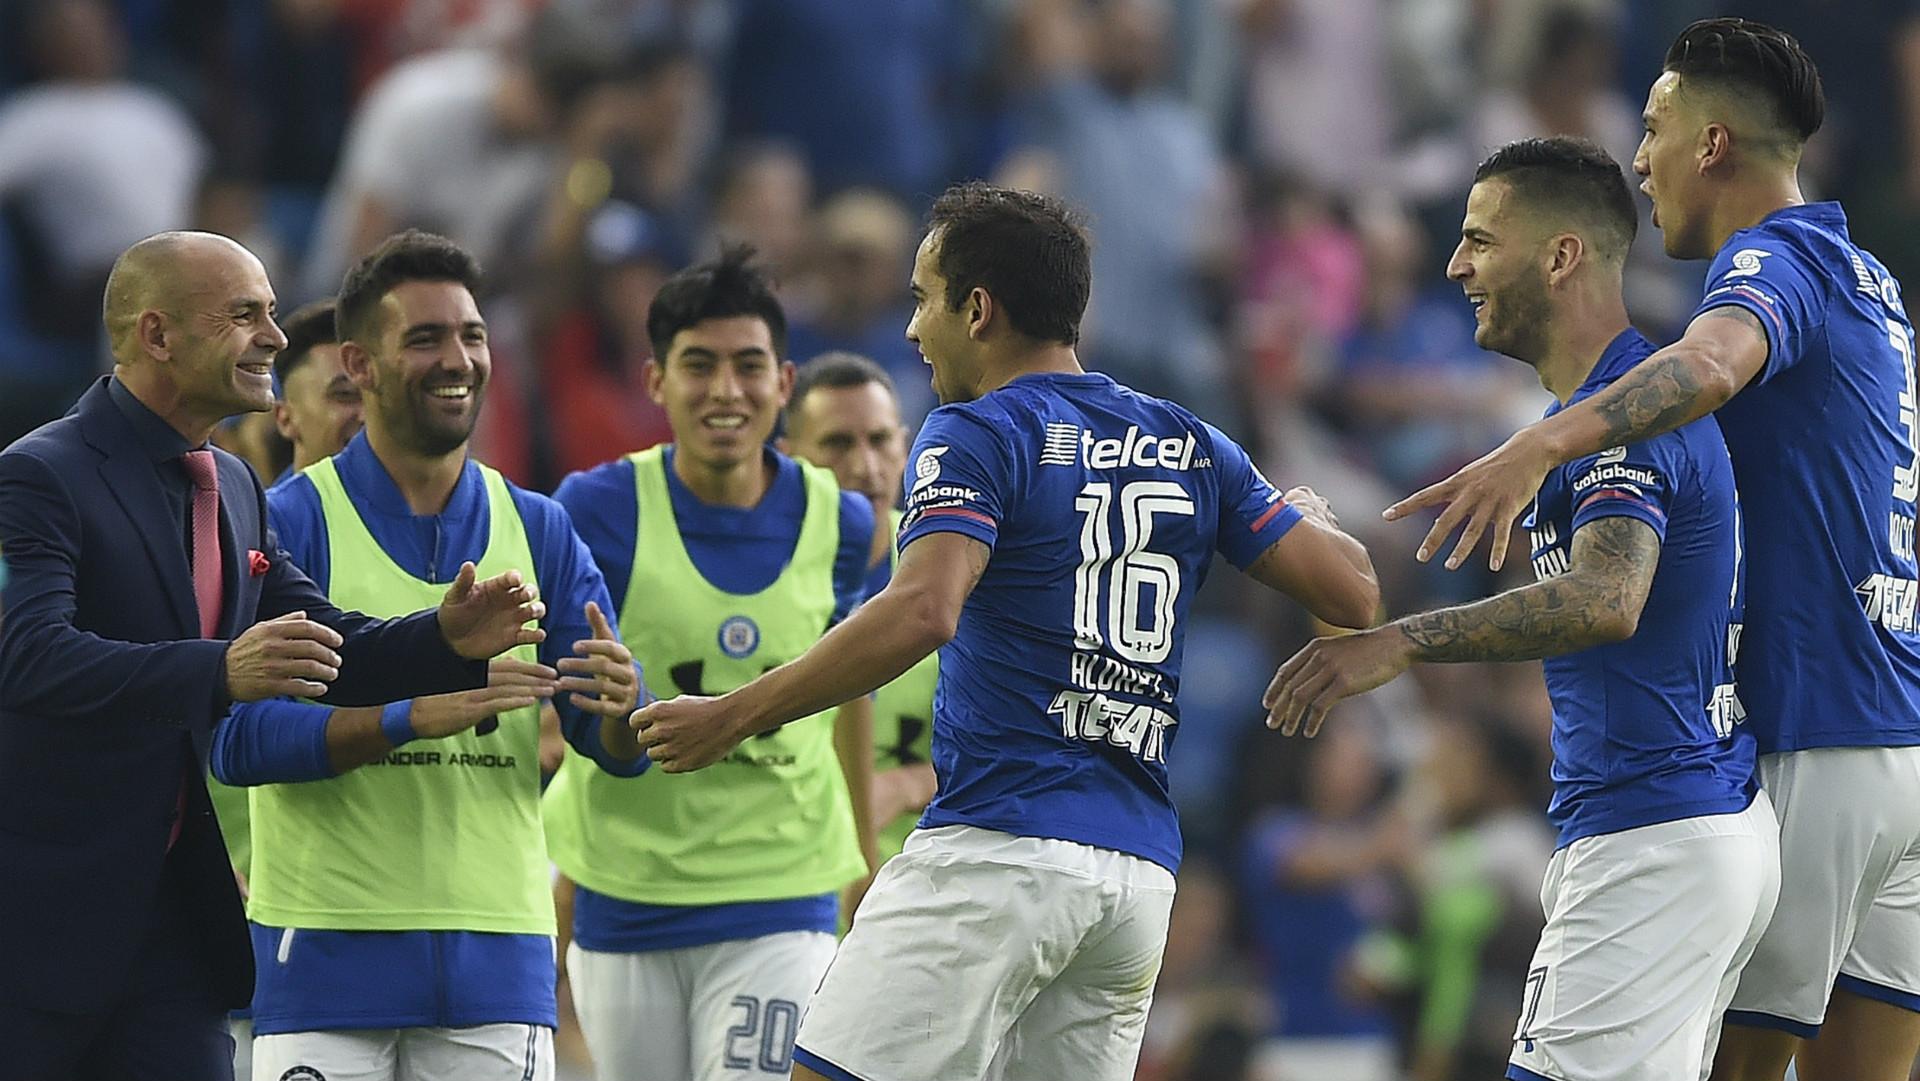 Adrian Aldrete Cruz Azul